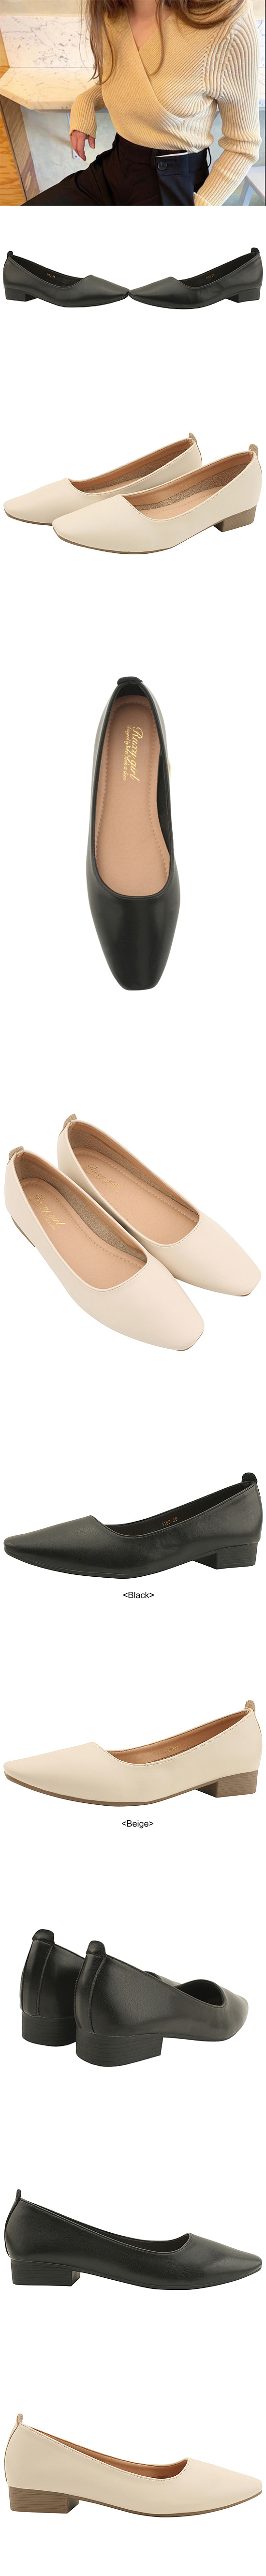 Square Toe Simple Loafers Low Heel Beige